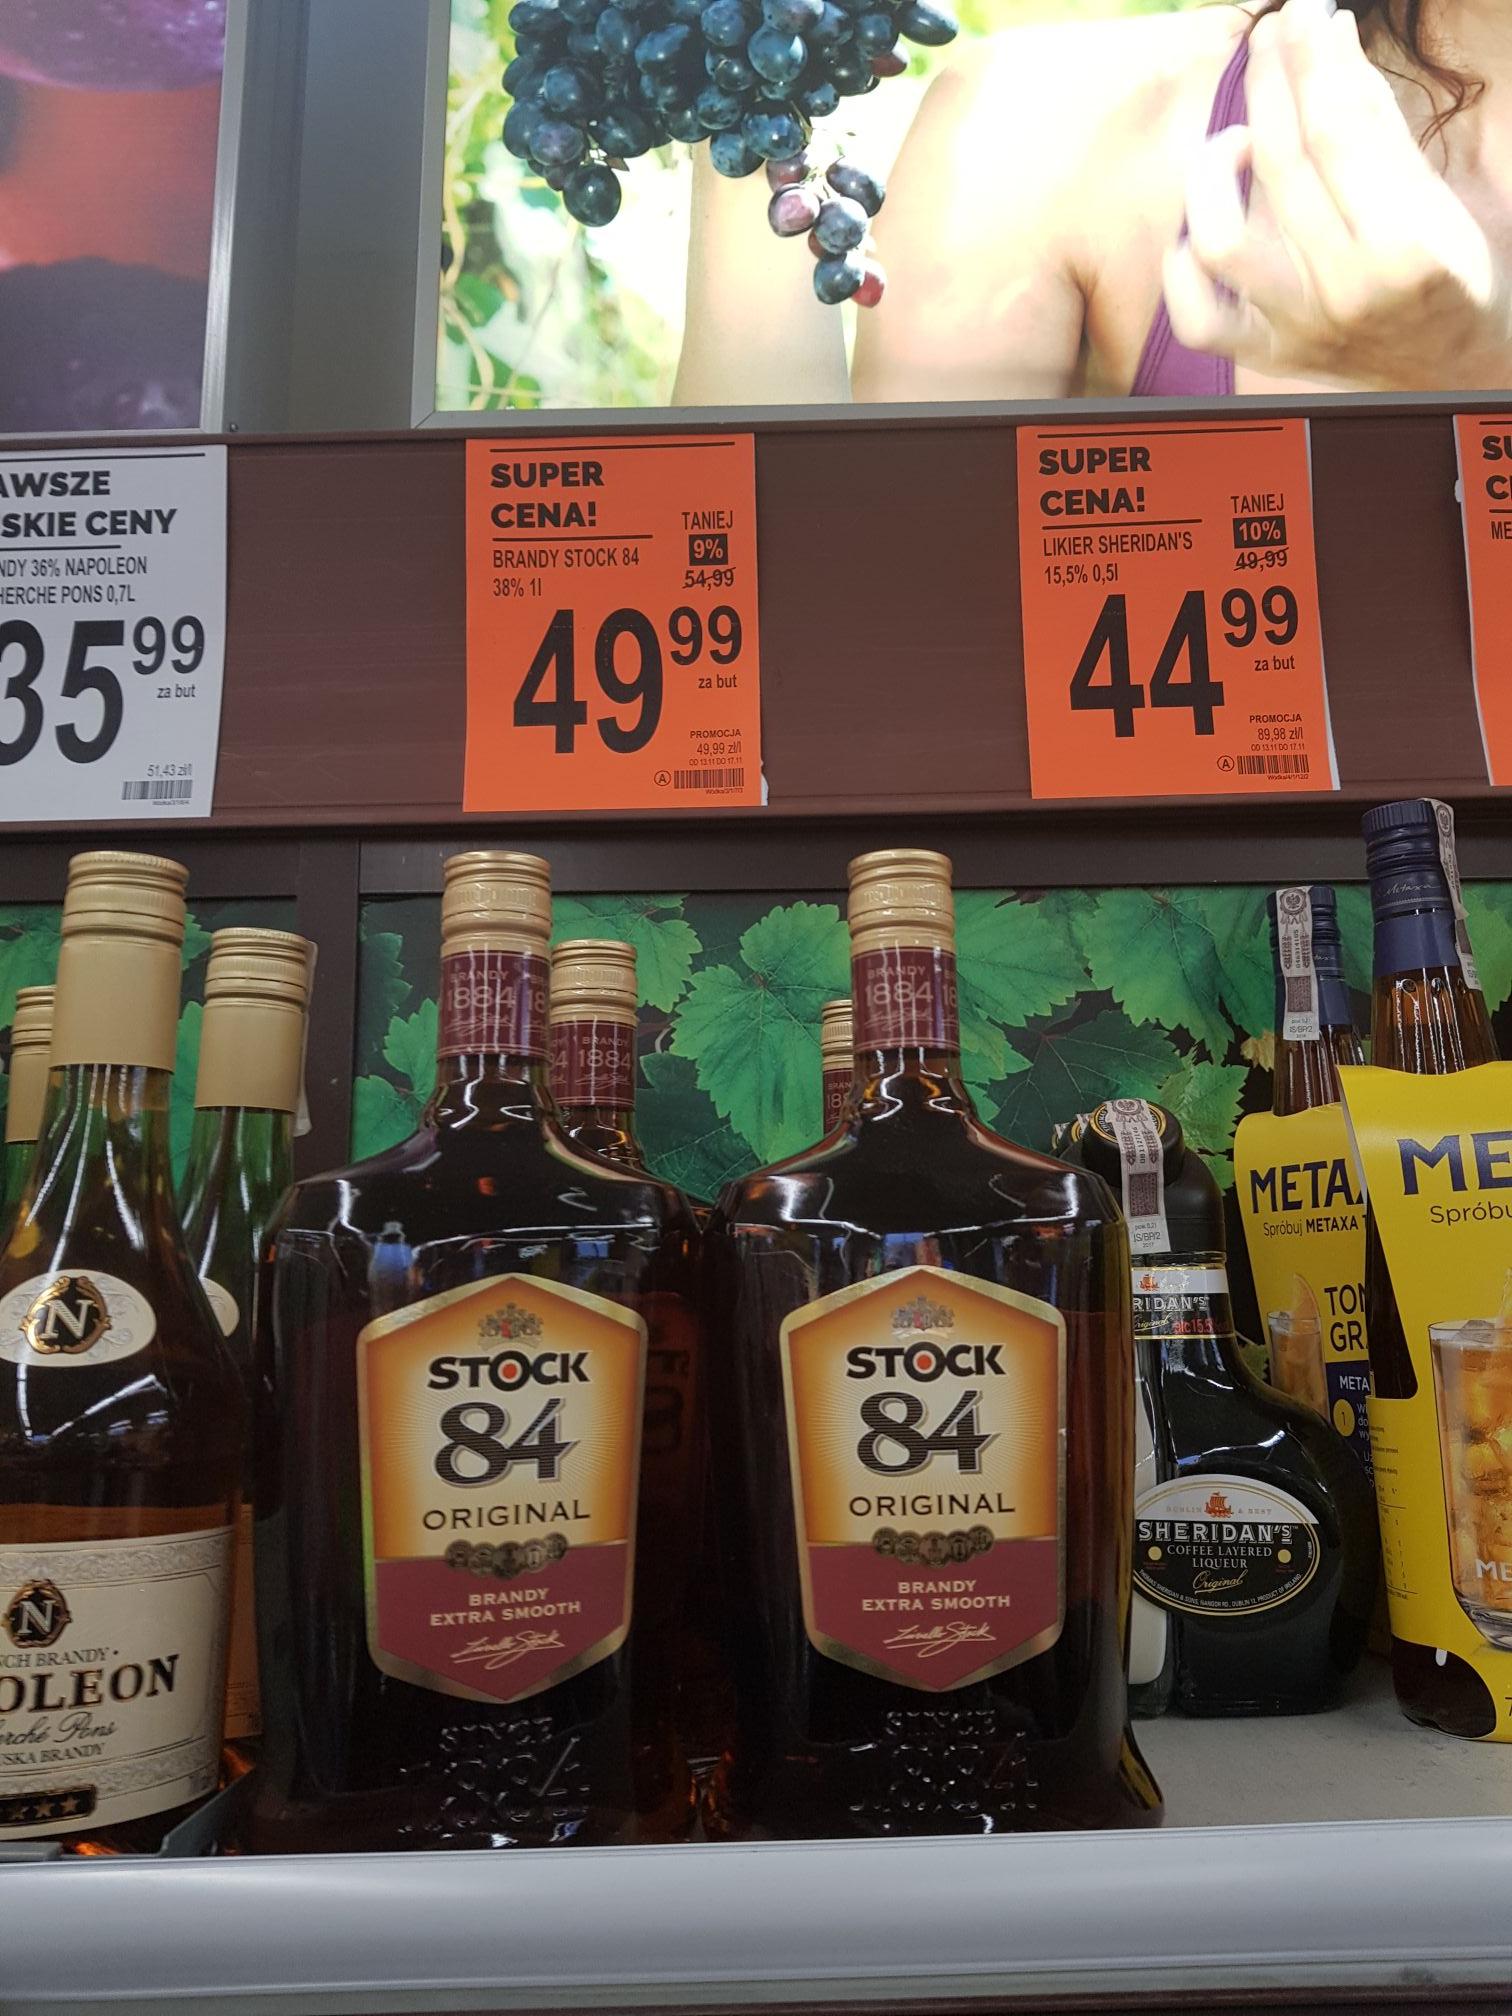 Stock 84 Brandy 1L. Biedronka